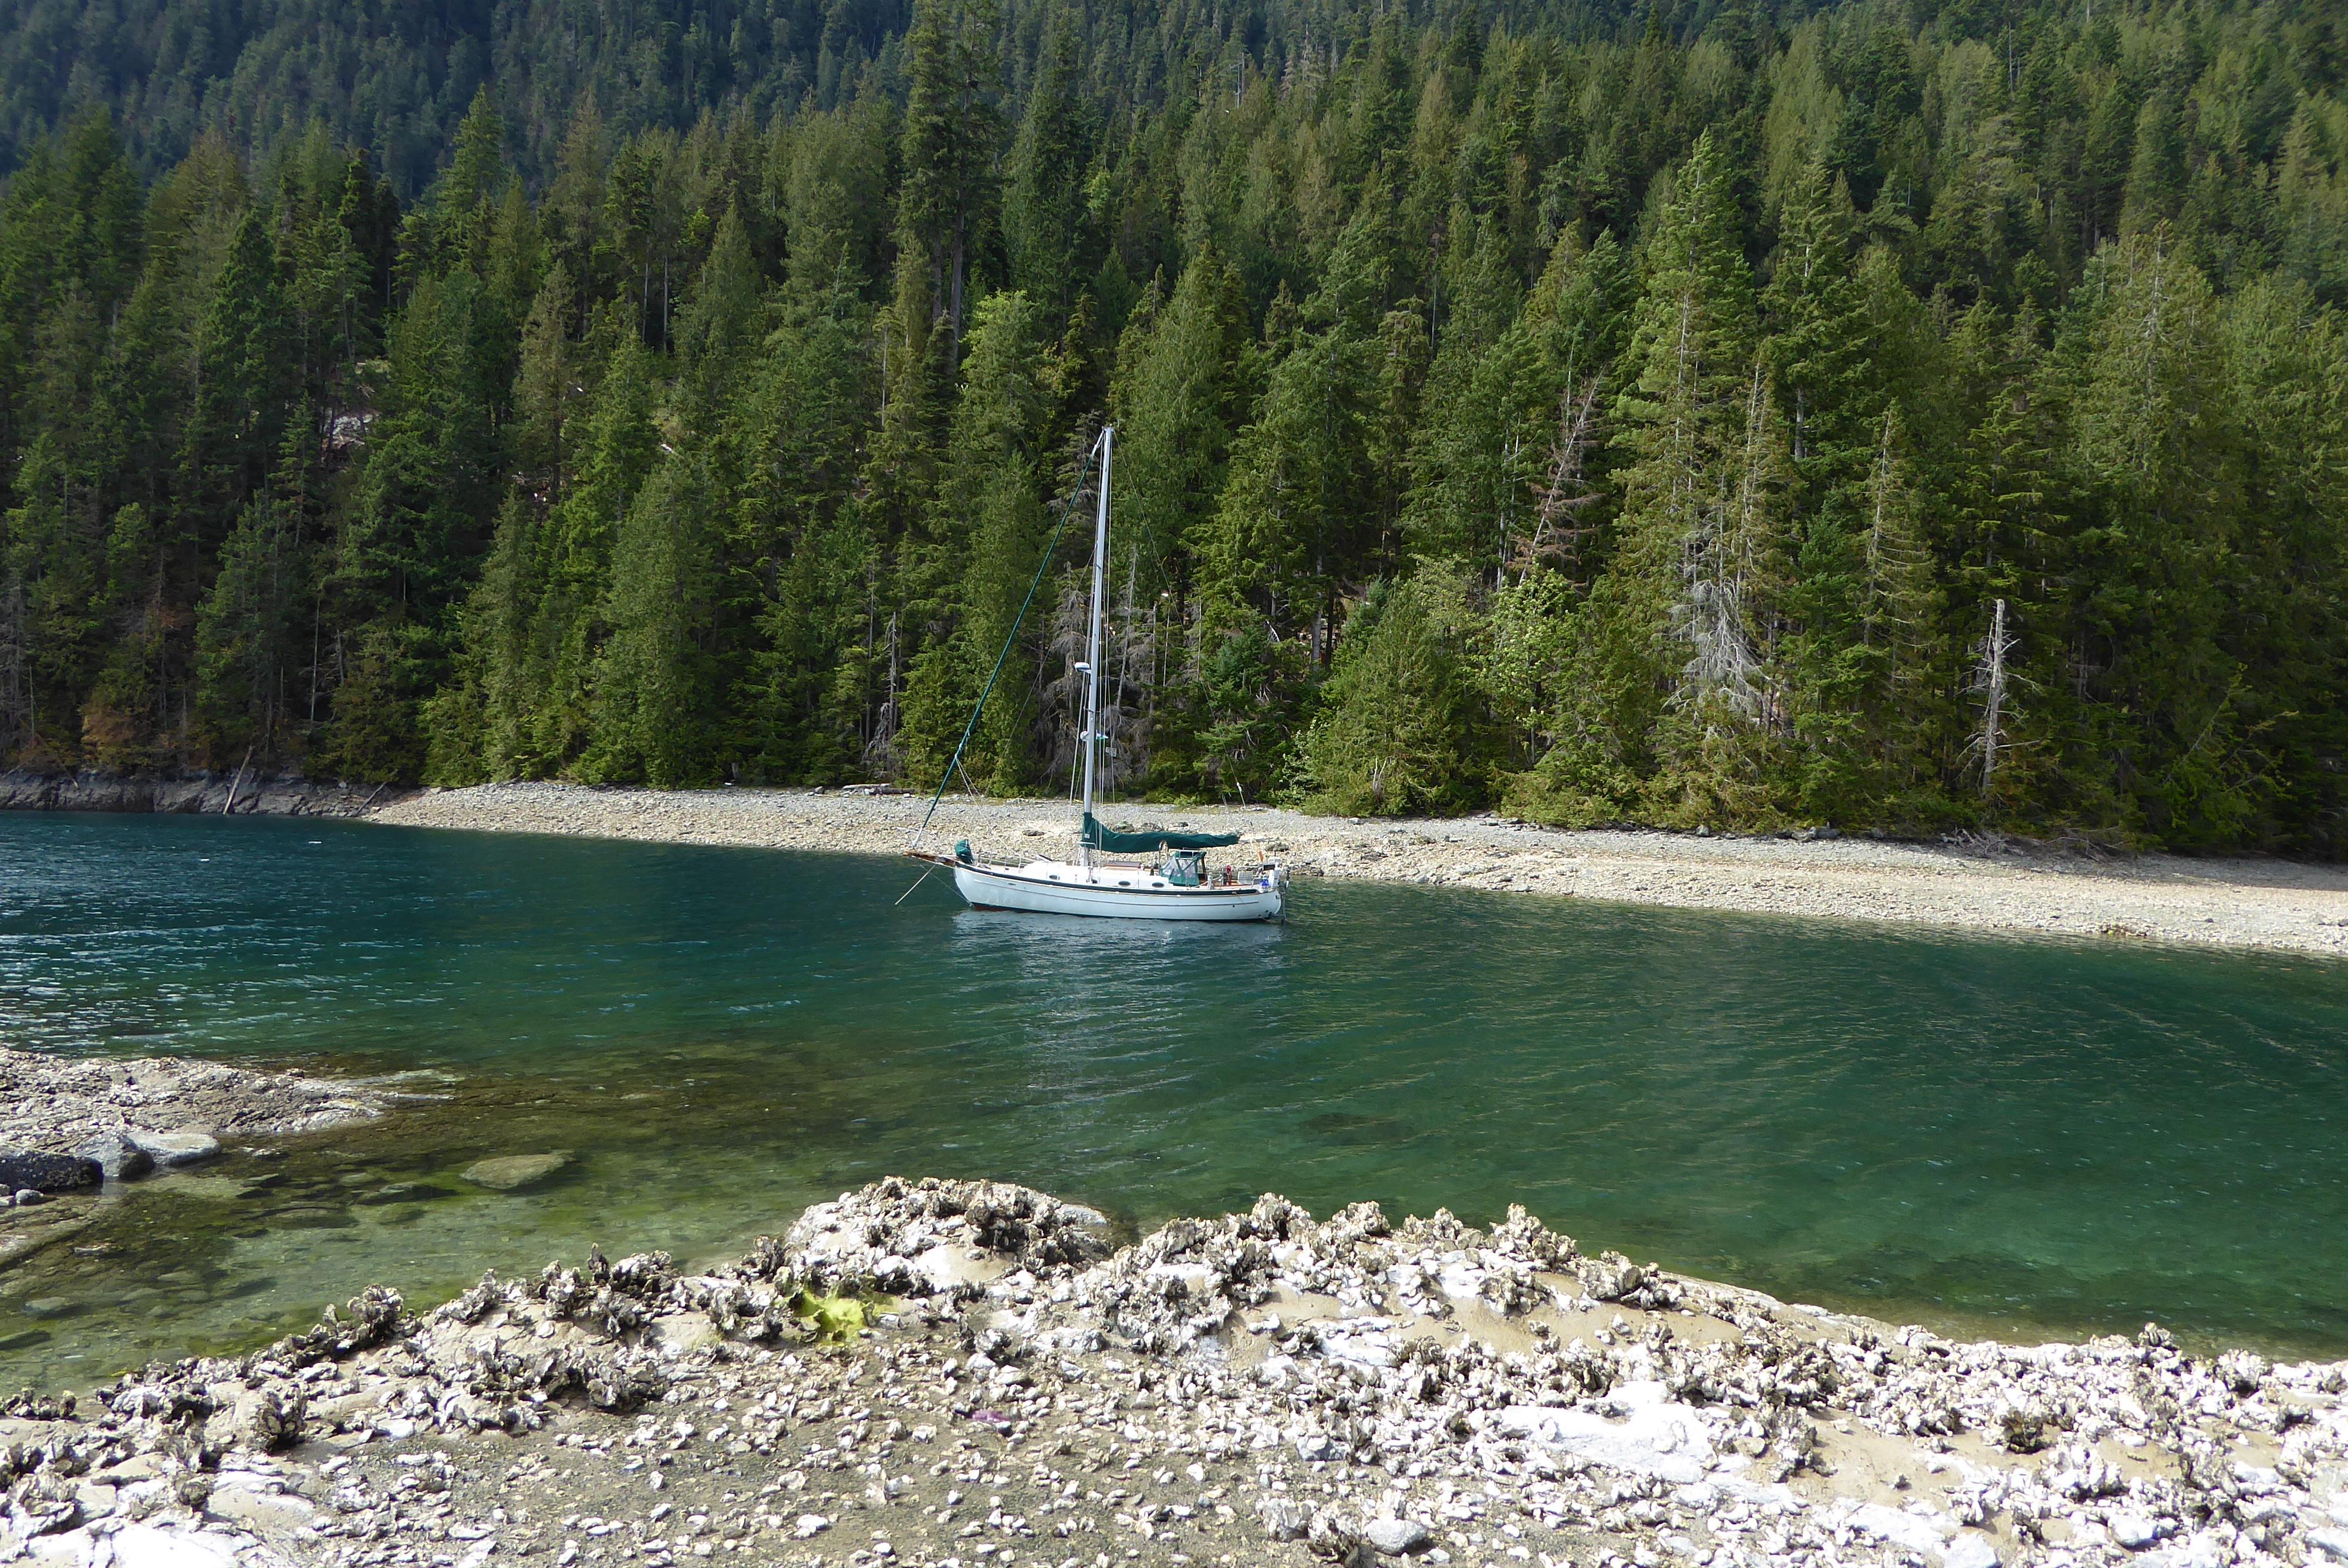 Leela at anchor in Desolation Sound